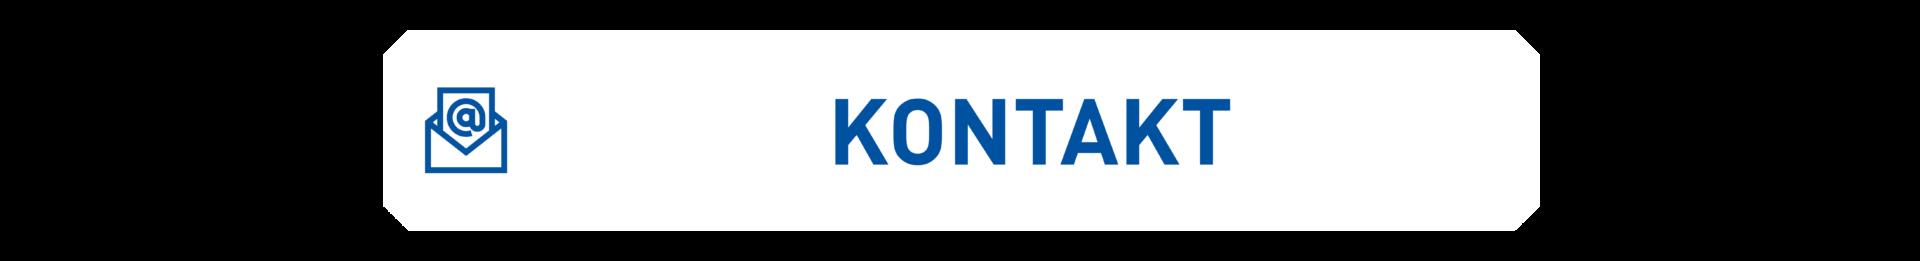 _KONTAKT_